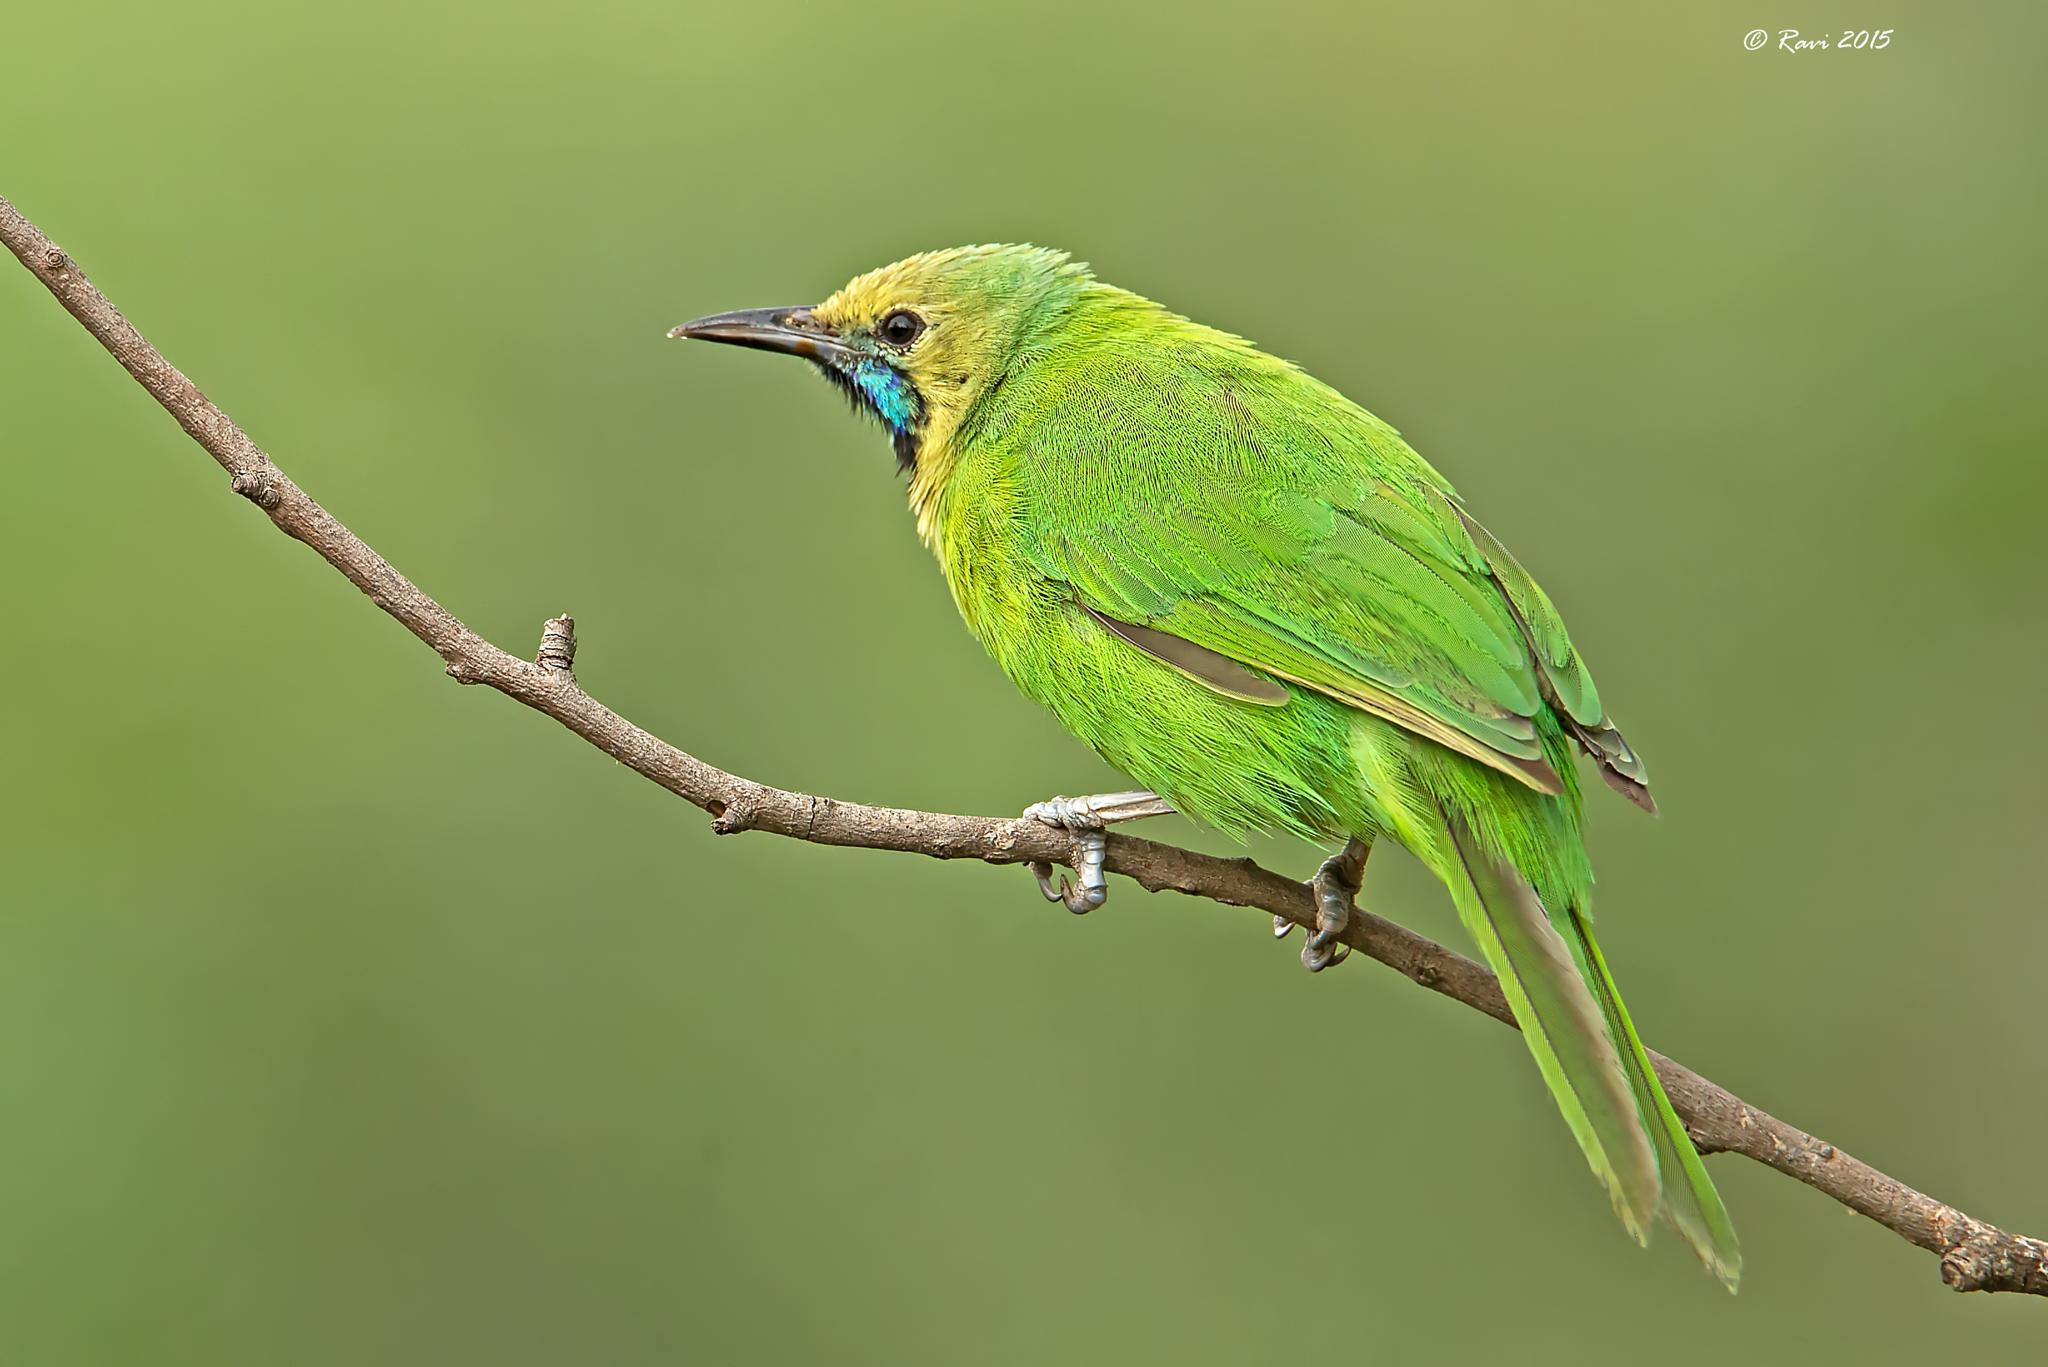 Jerdon's Leafbird by Ravi Ramakrishnappa